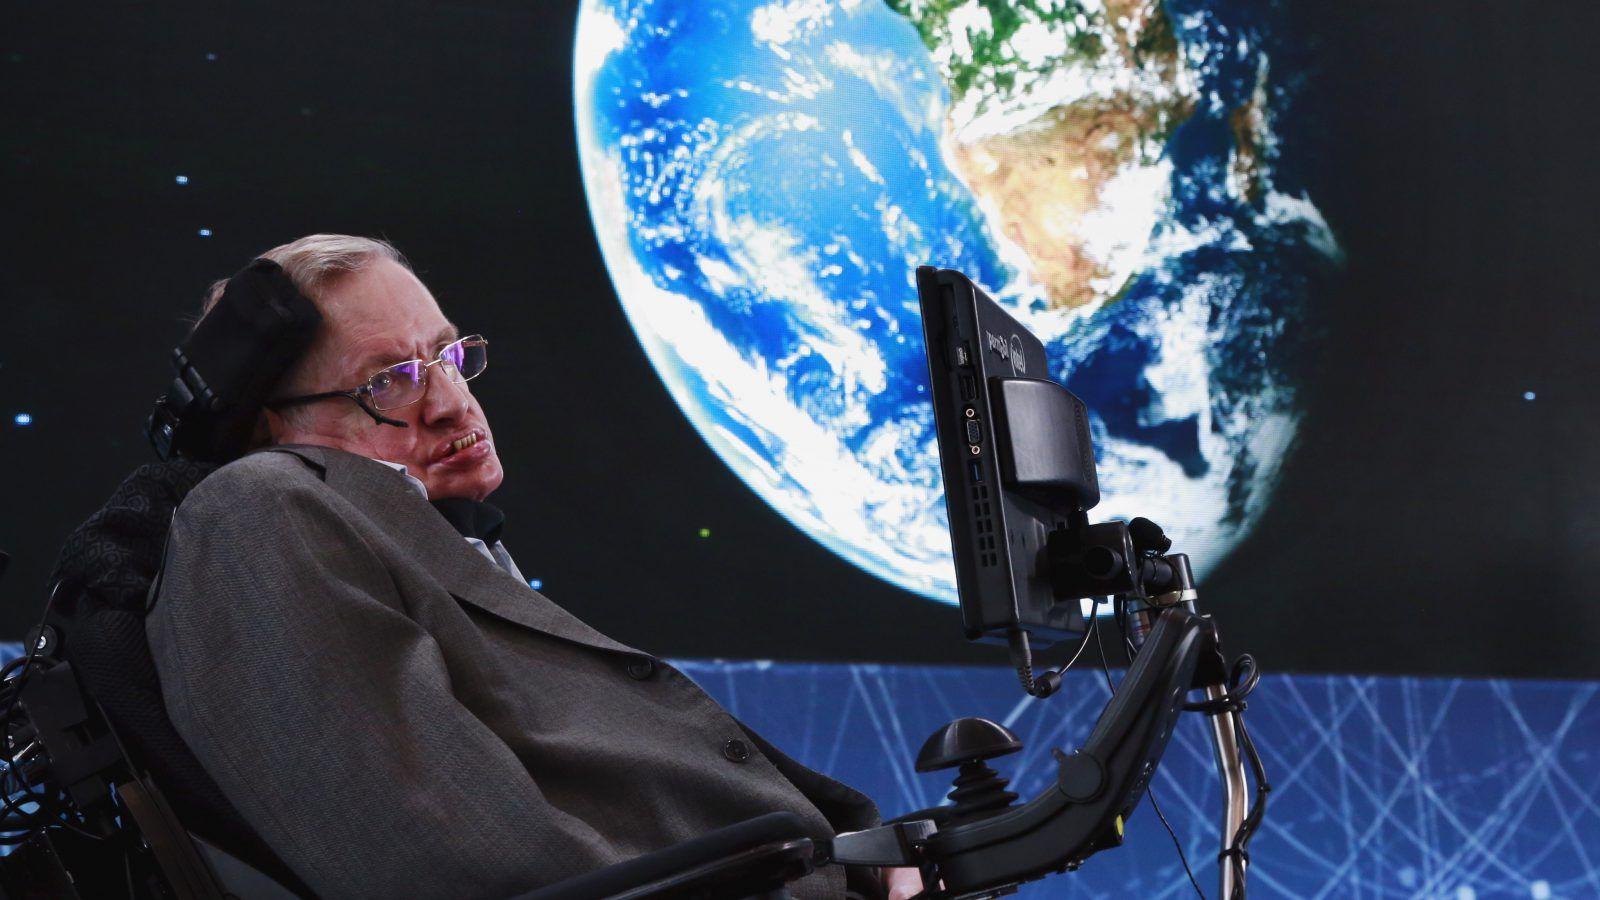 Tech giants mourn Hawking's death | Latest News